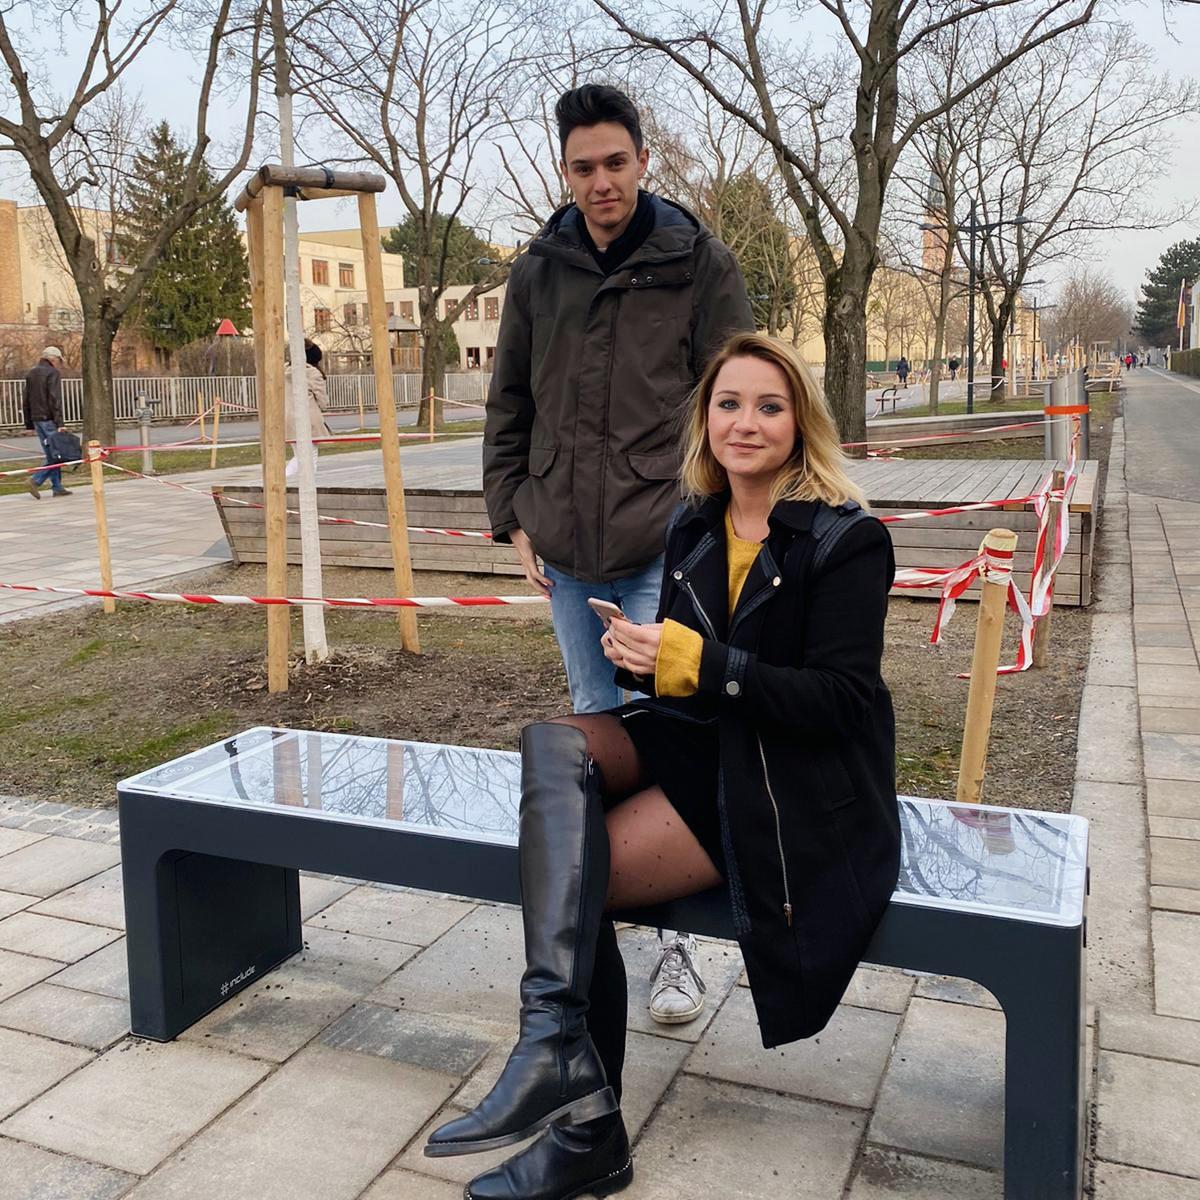 Solar-Sitzbänke: Energietanken in Döbling